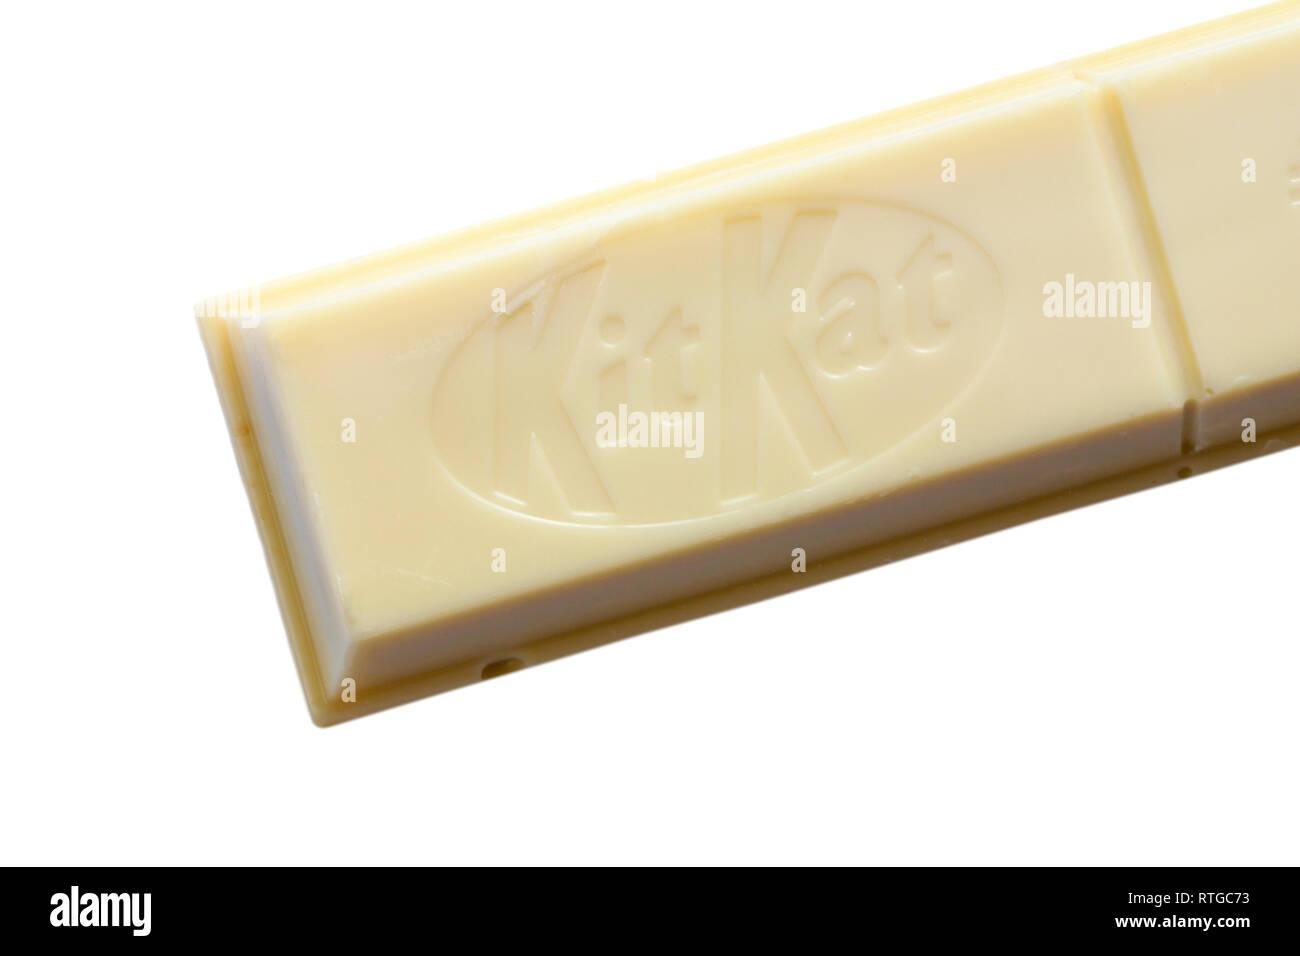 Nestle KitKat chunky white chocolate set on white background - crispy wafer fingers covered with white chocolate - close up - Stock Image